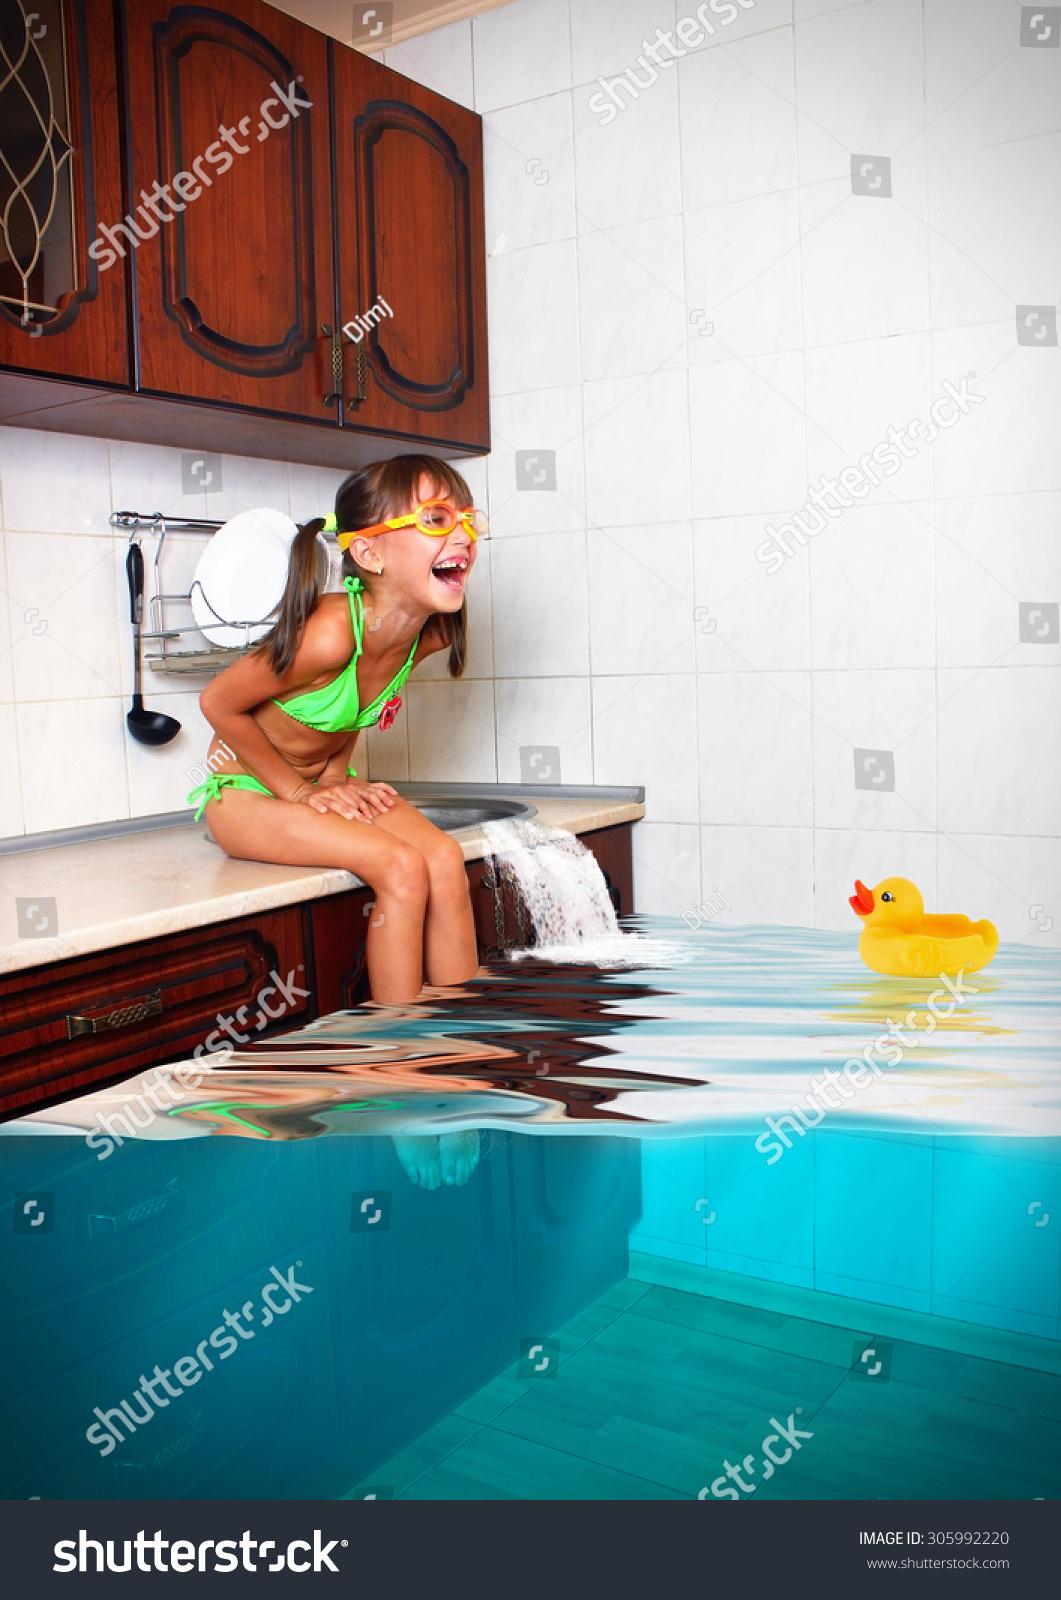 Child Girl Make Mess Flooded Kitchen Stock Photo 305992220 Shutterstock